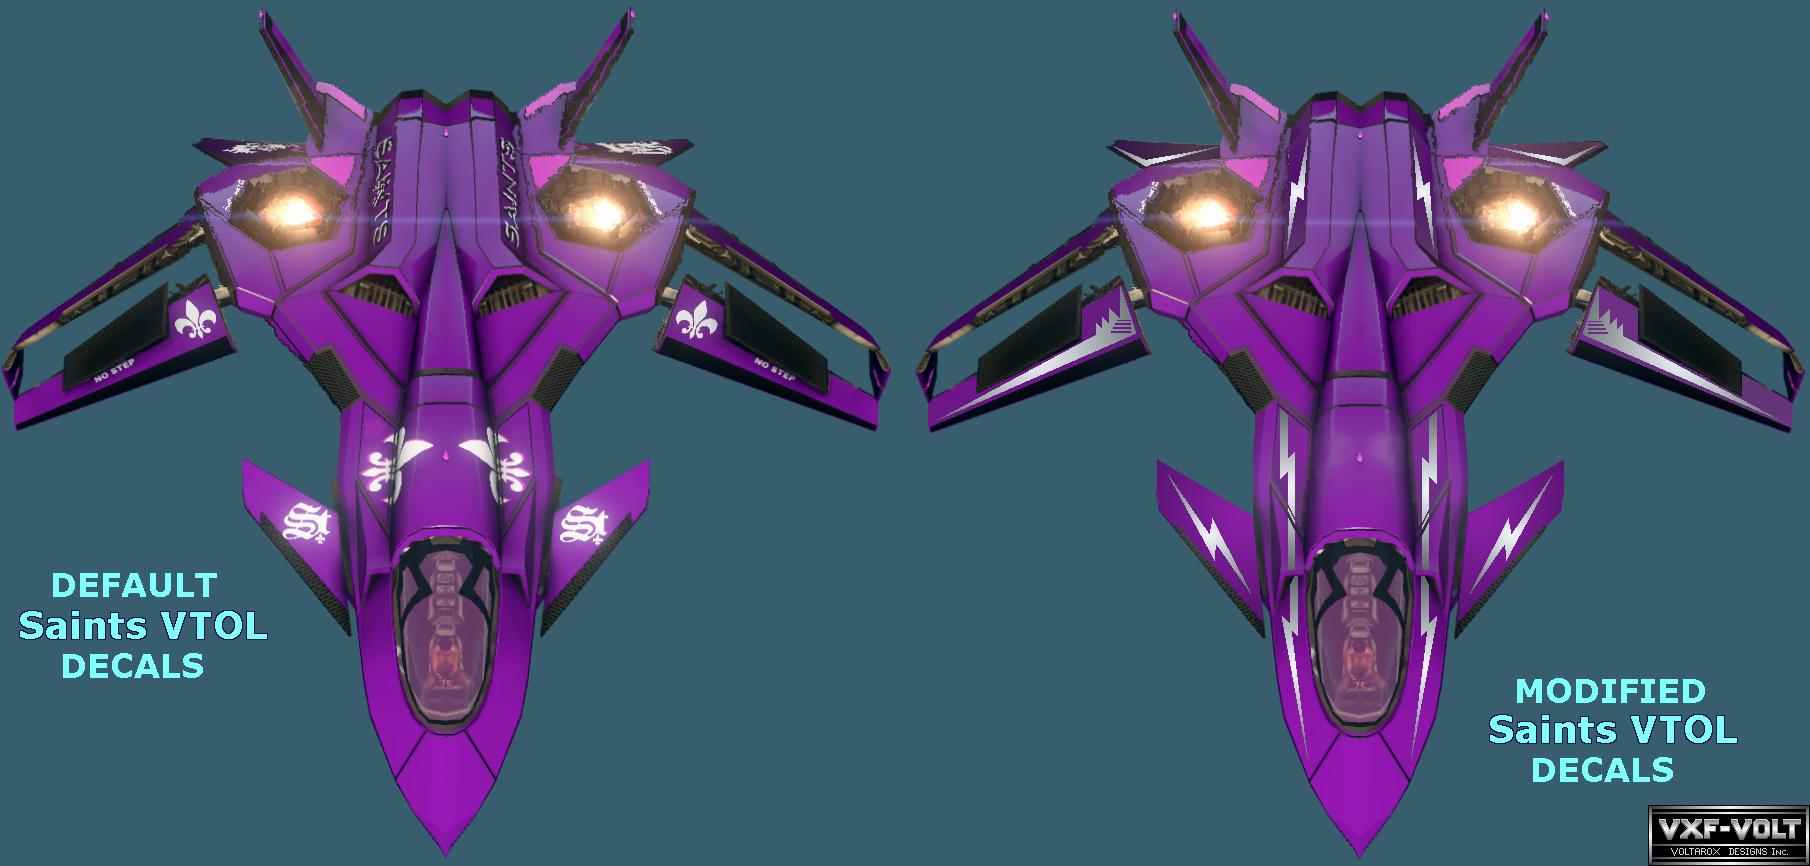 f 69 vtol saints row vs hydra gta spacebattles forums